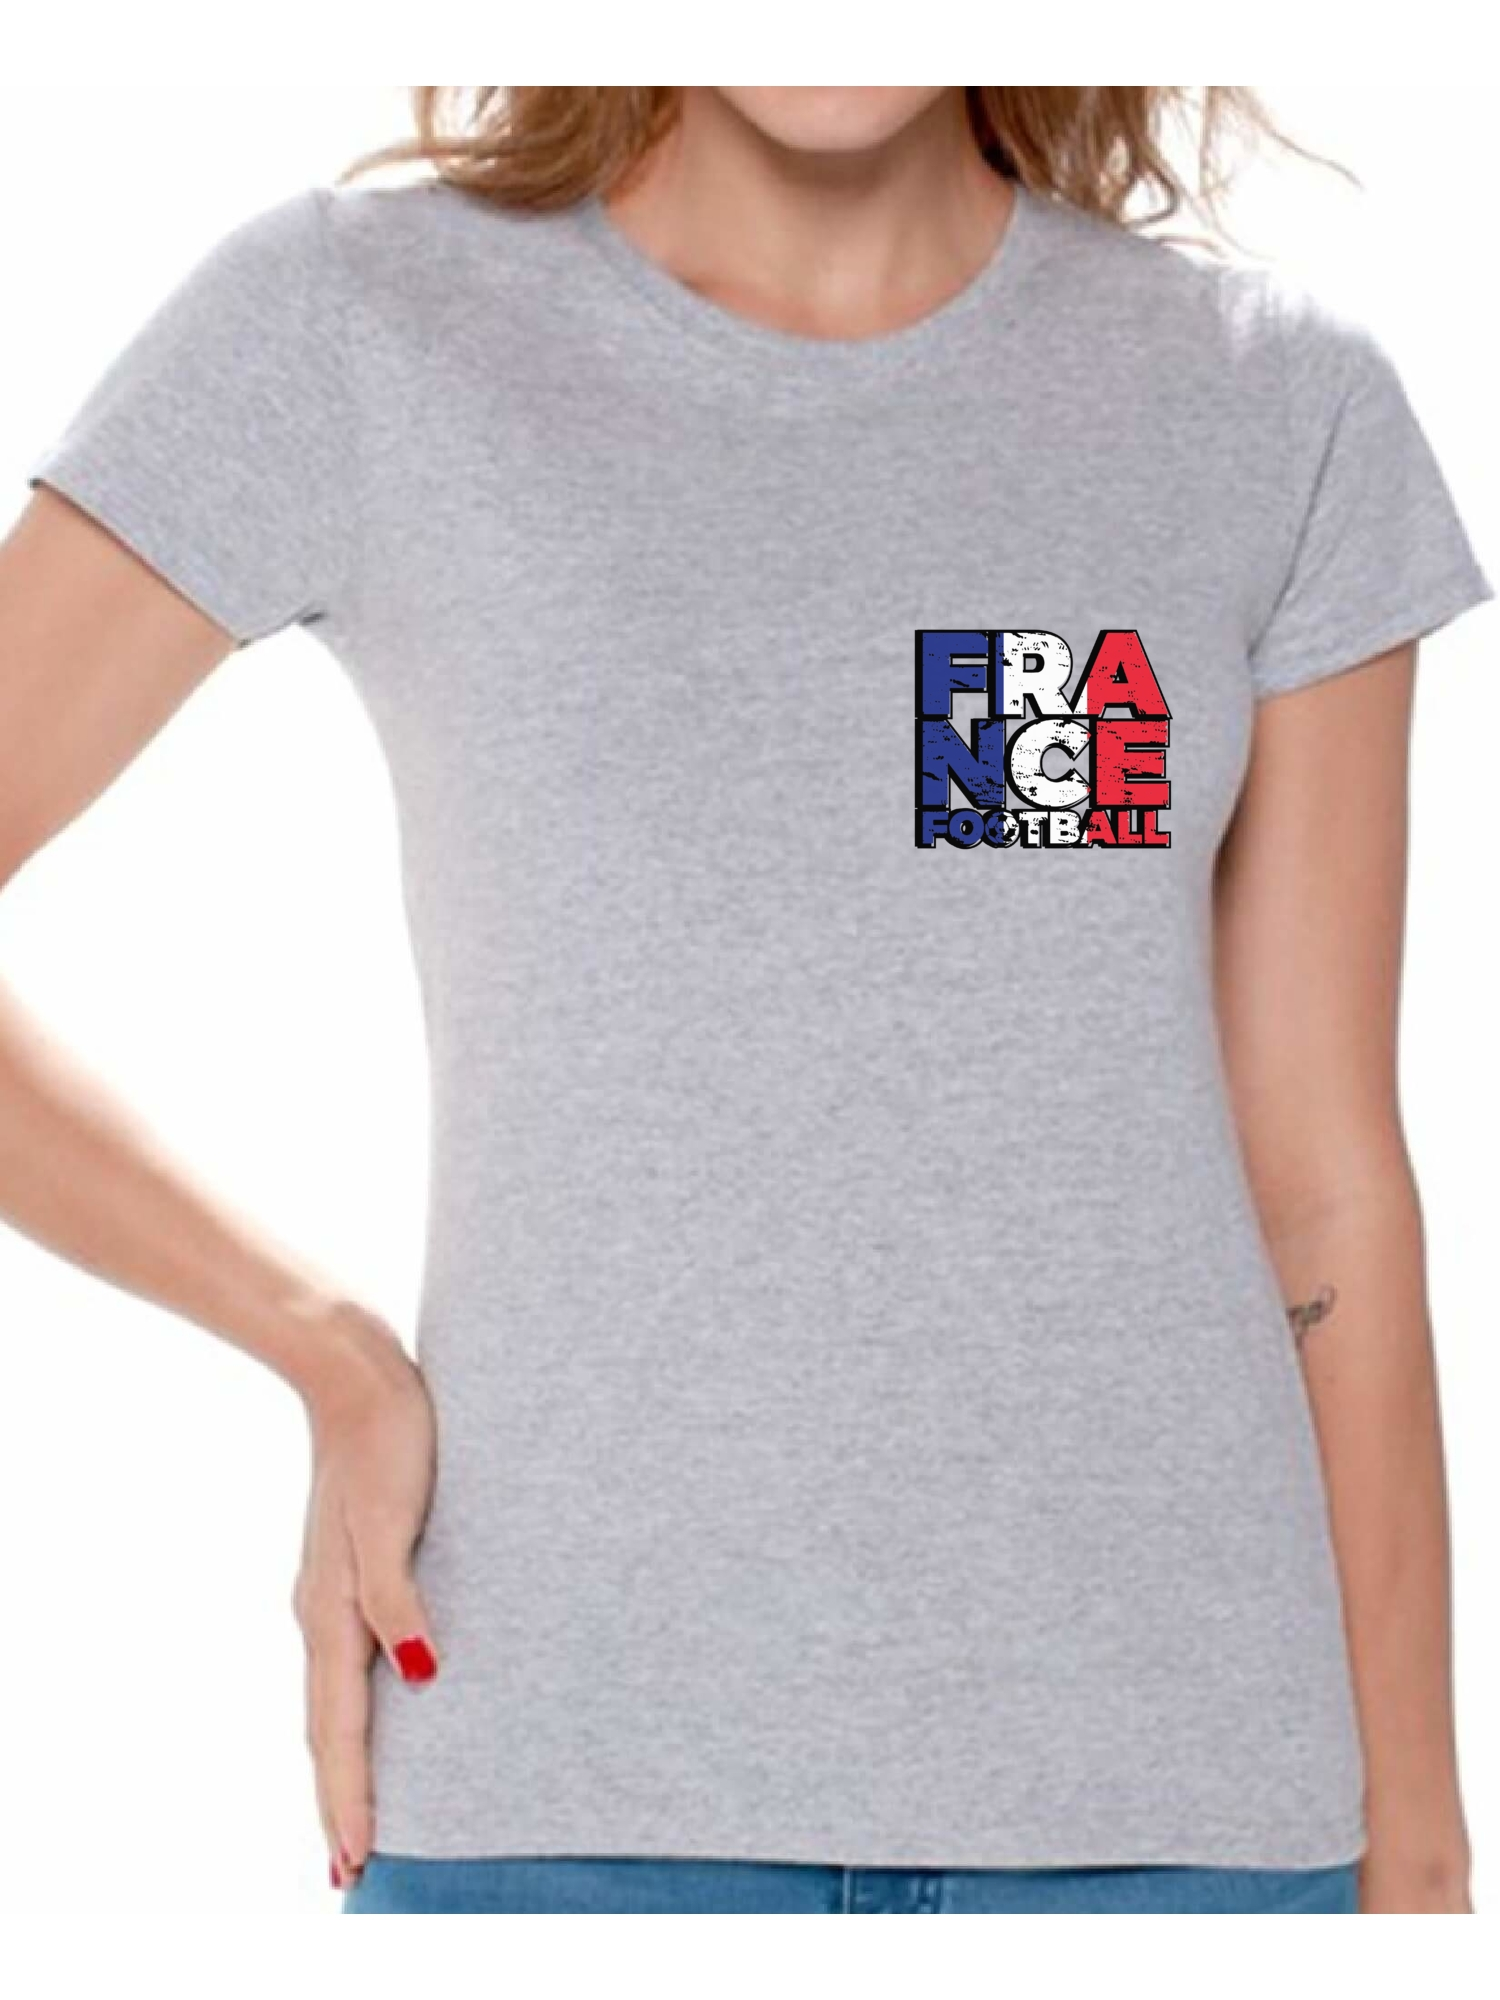 55153a603 Awkward Styles France Football Shirt for Women French Soccer Tshirt France  Shirts for Women France 2018 Tshirt French Soccer 2018 France Gifts Gifts  from ...